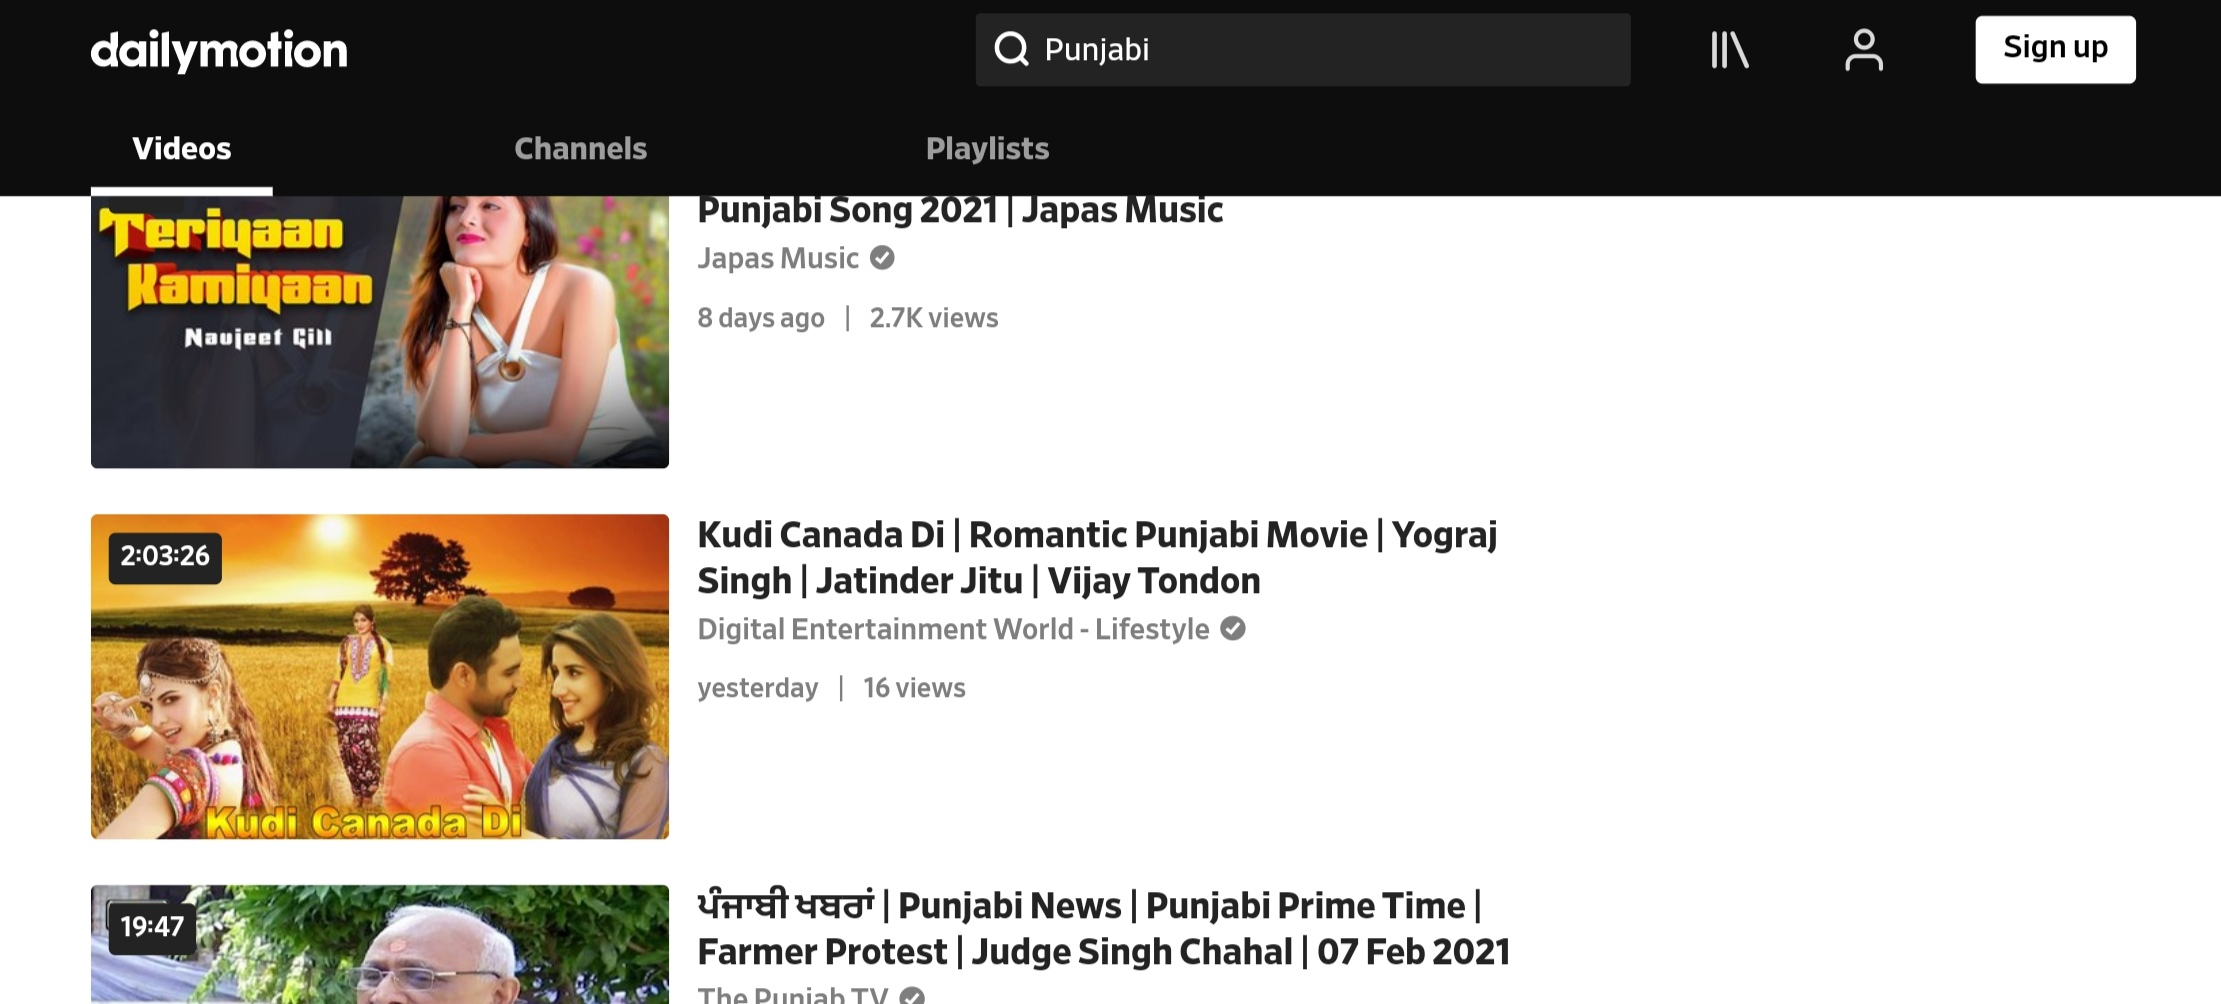 Watch Punjabi movies online dailymotion